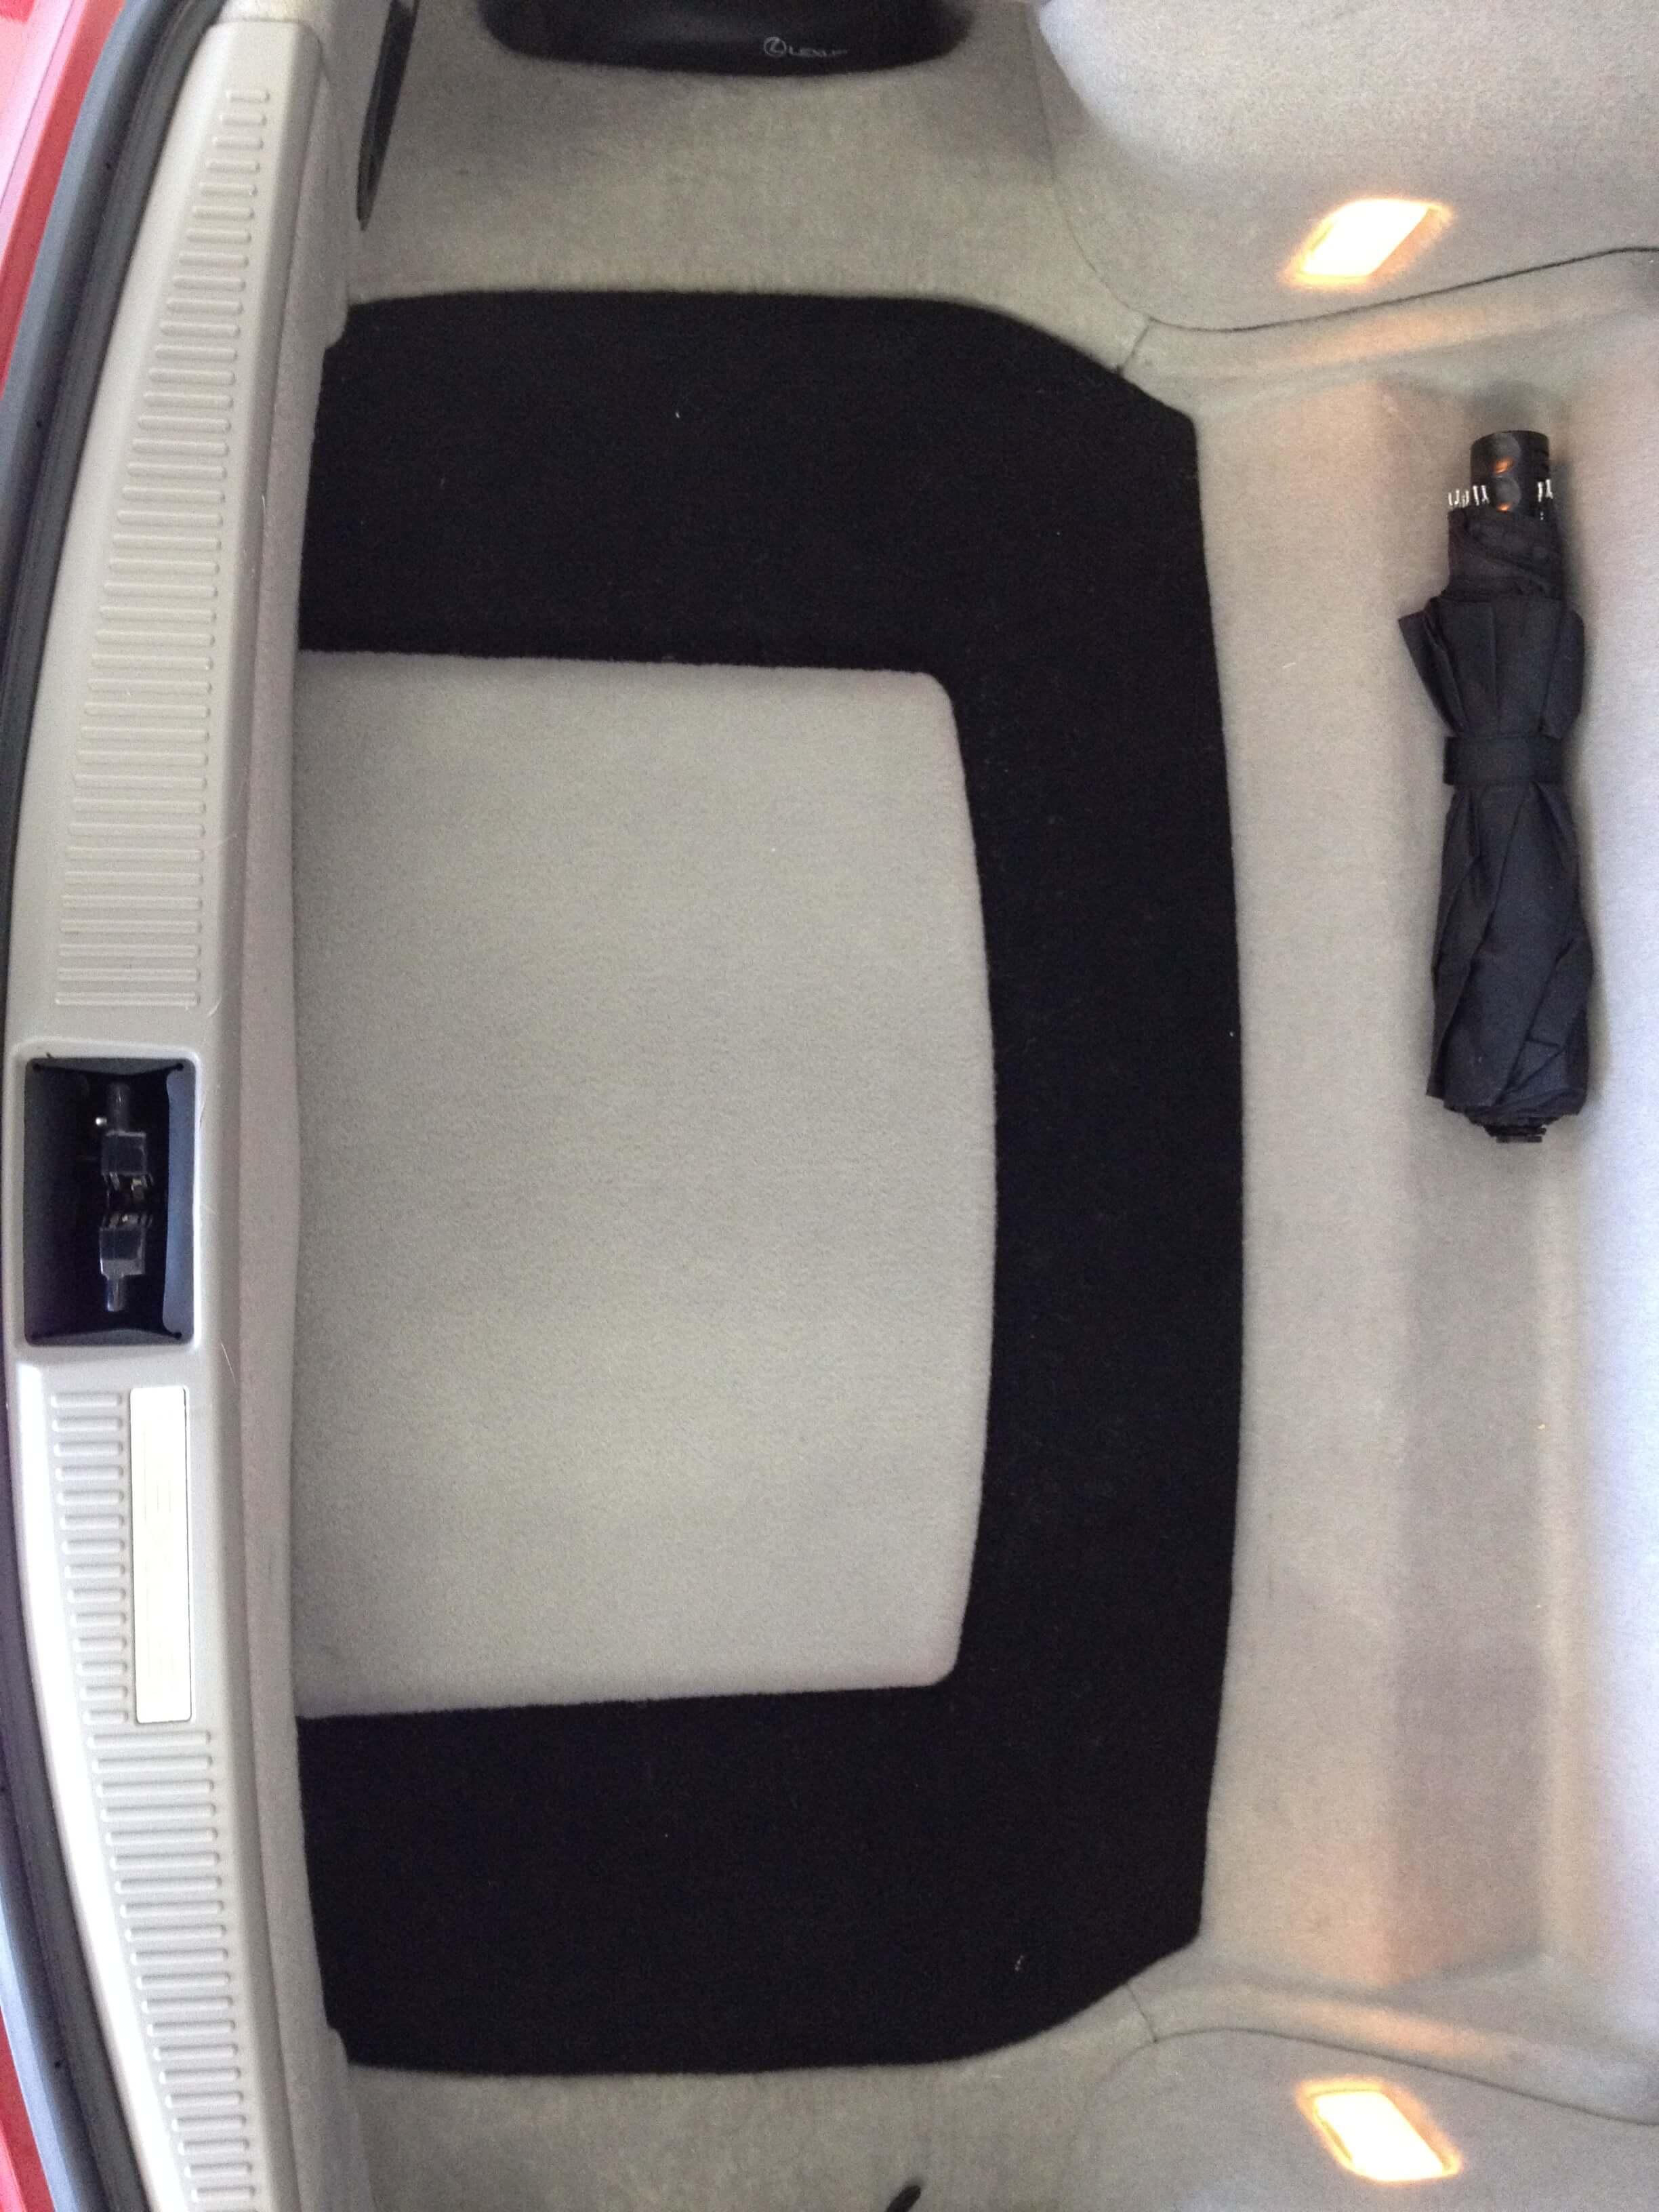 2008 Lexus SC430 gets a custom subwoofer enclosure, amplifier and